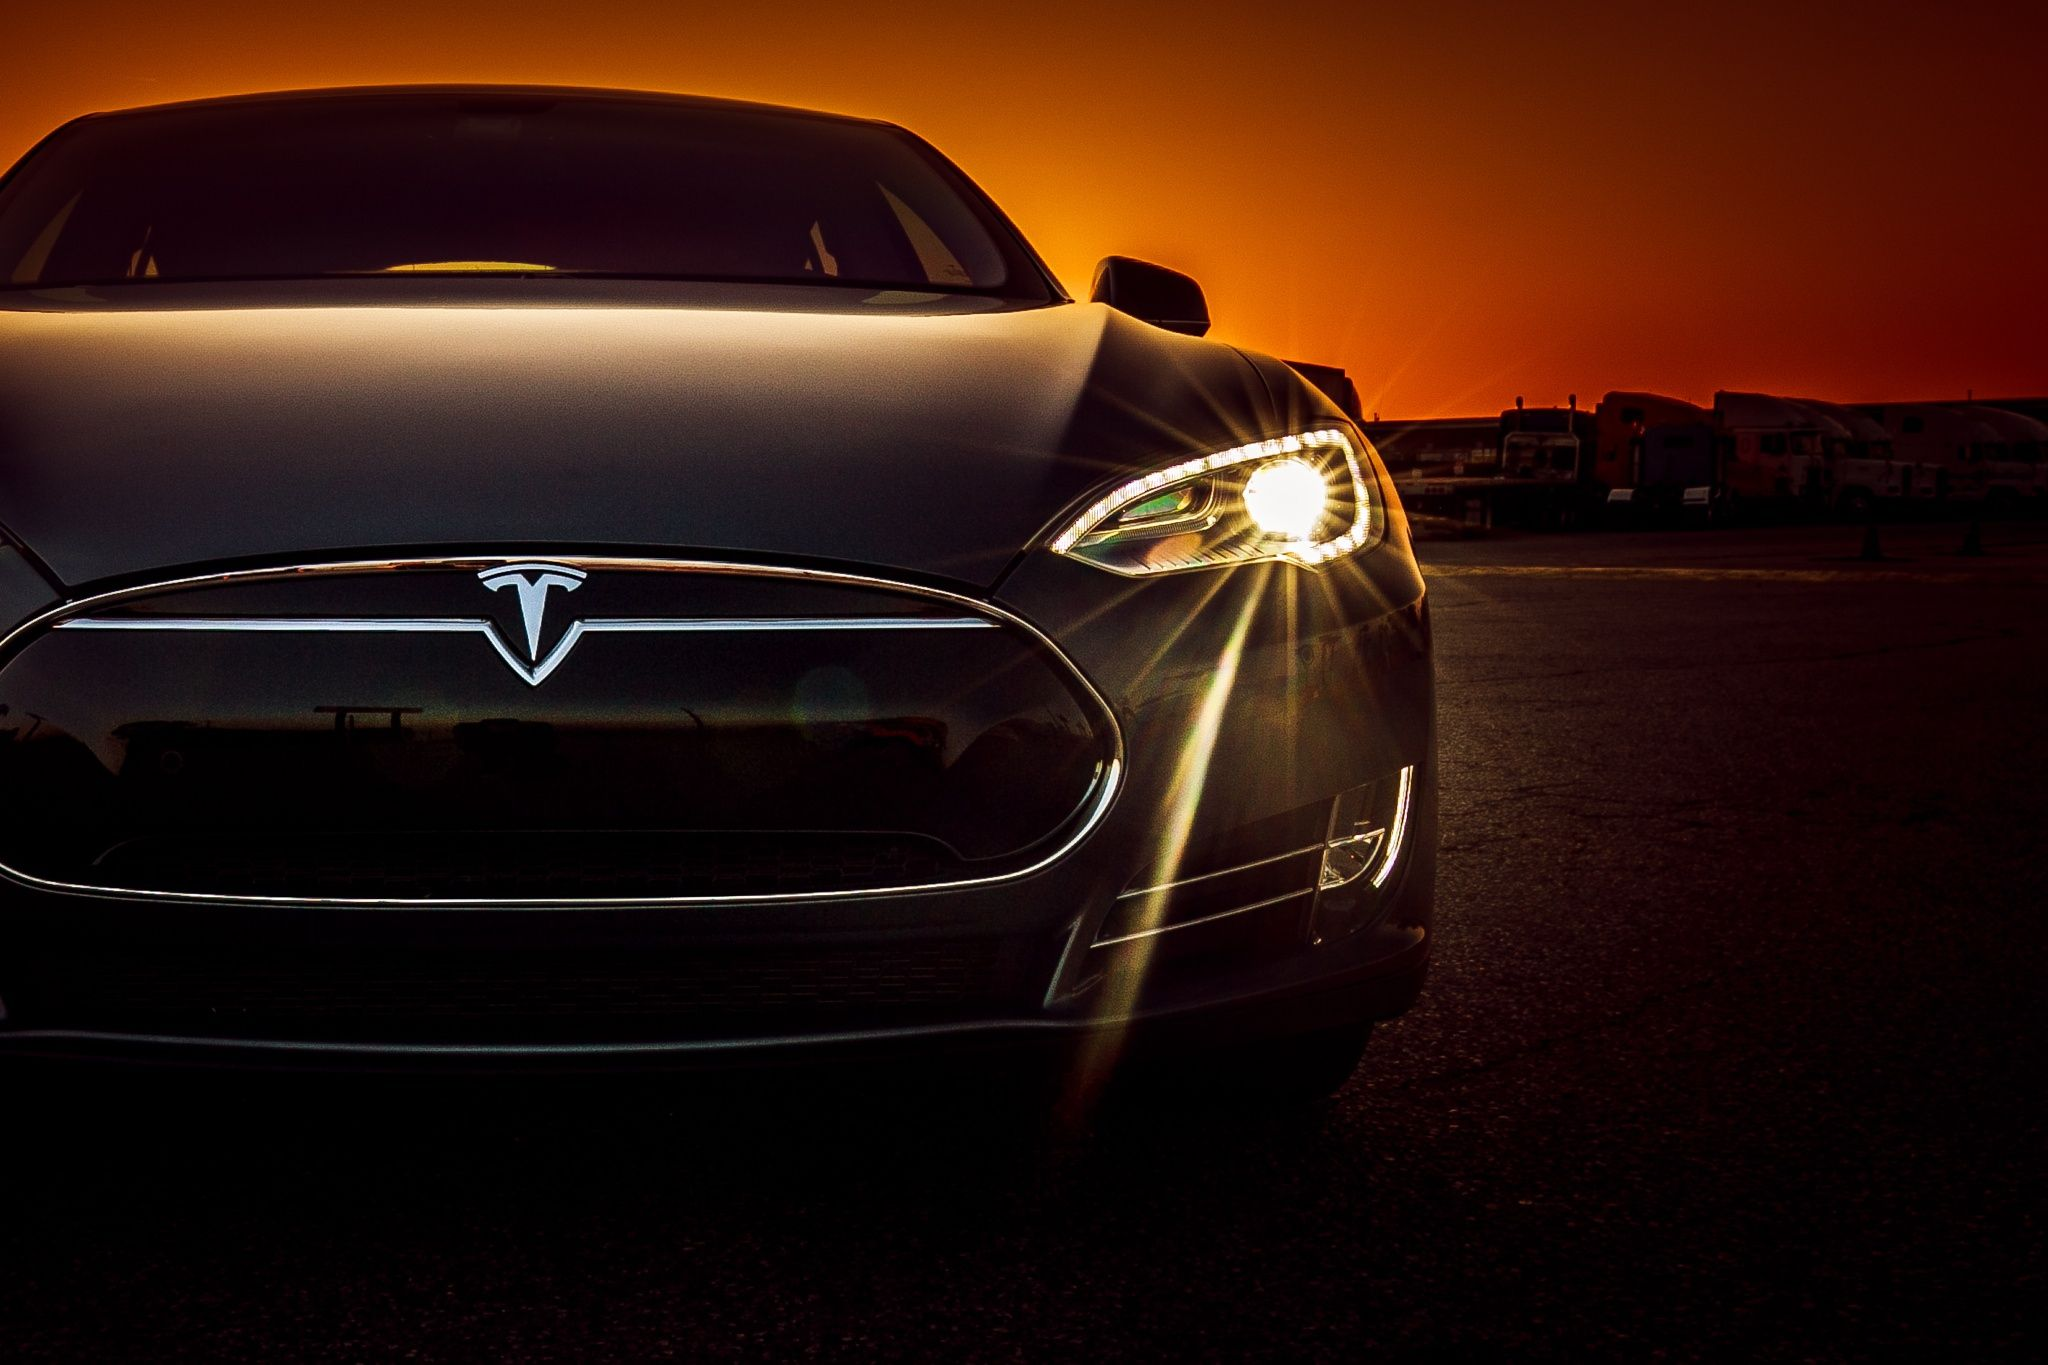 2014 Tesla Model S 85kWh Tesla model s, Tesla model, Tesla